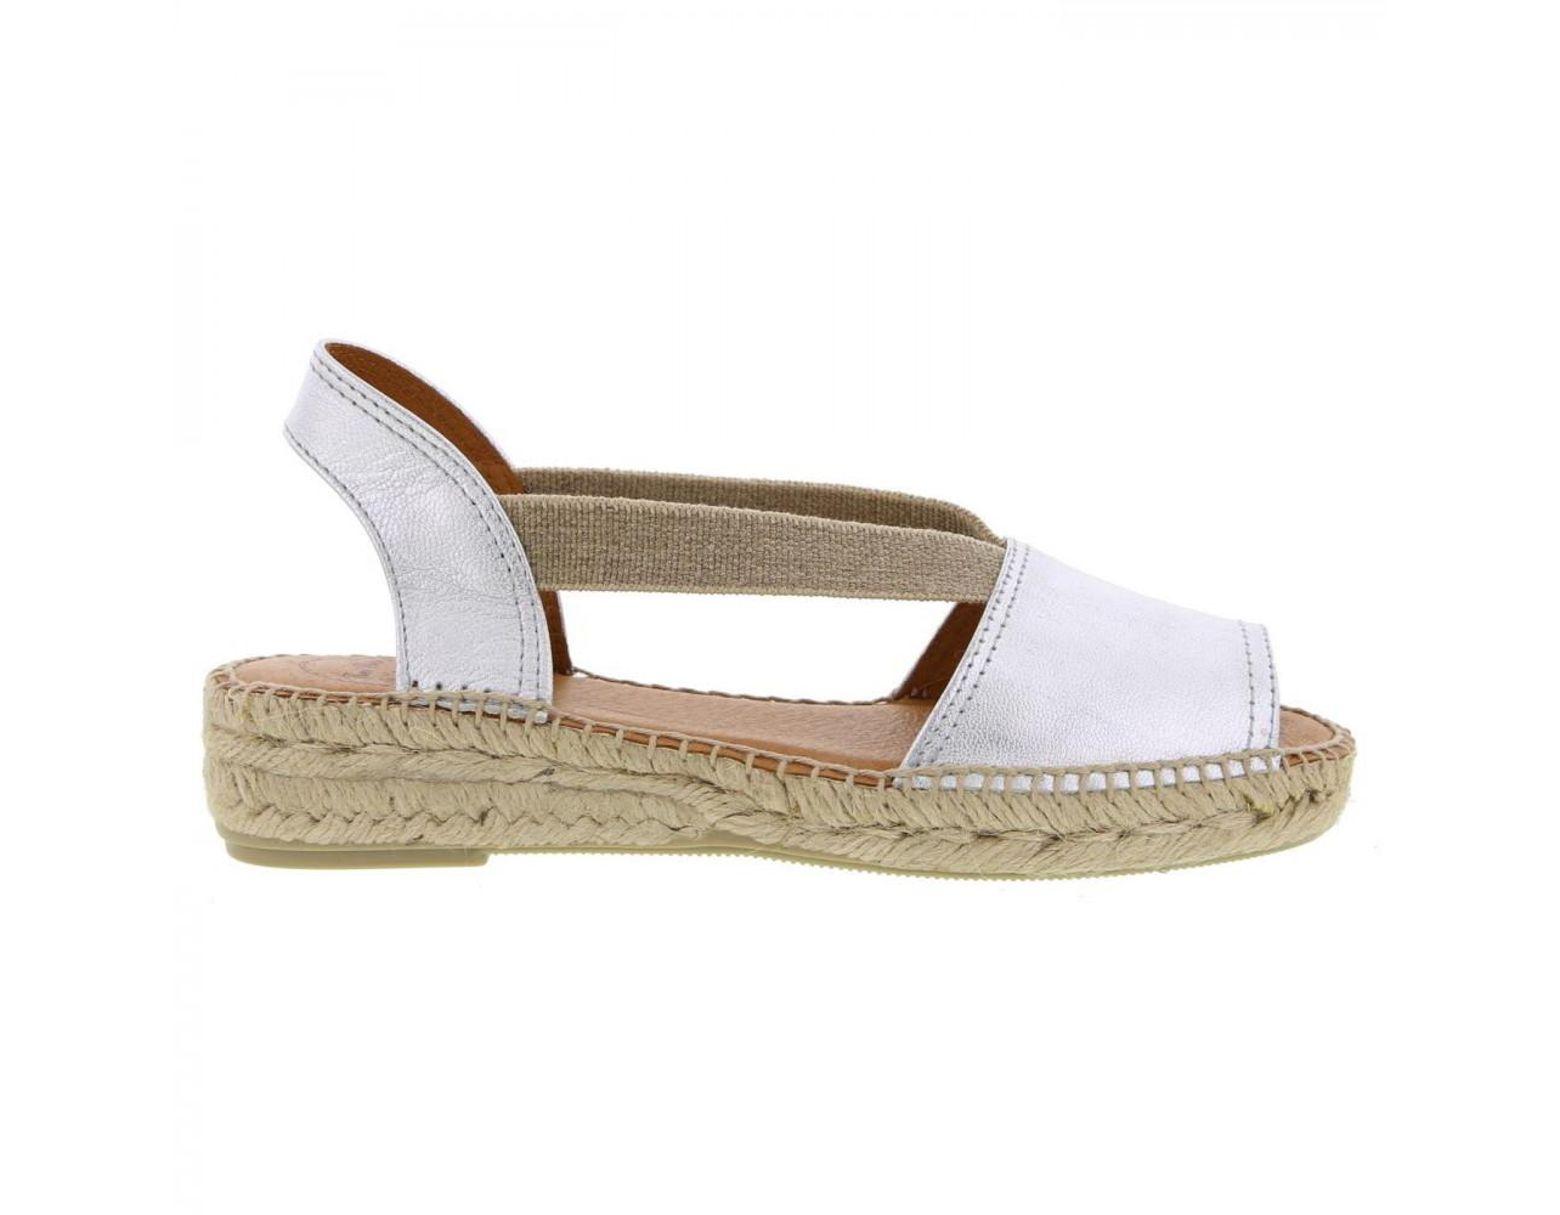 b2b3b8425e3 Women's Metallic Etna Leather Slingback Espadrille Sandals Shoes